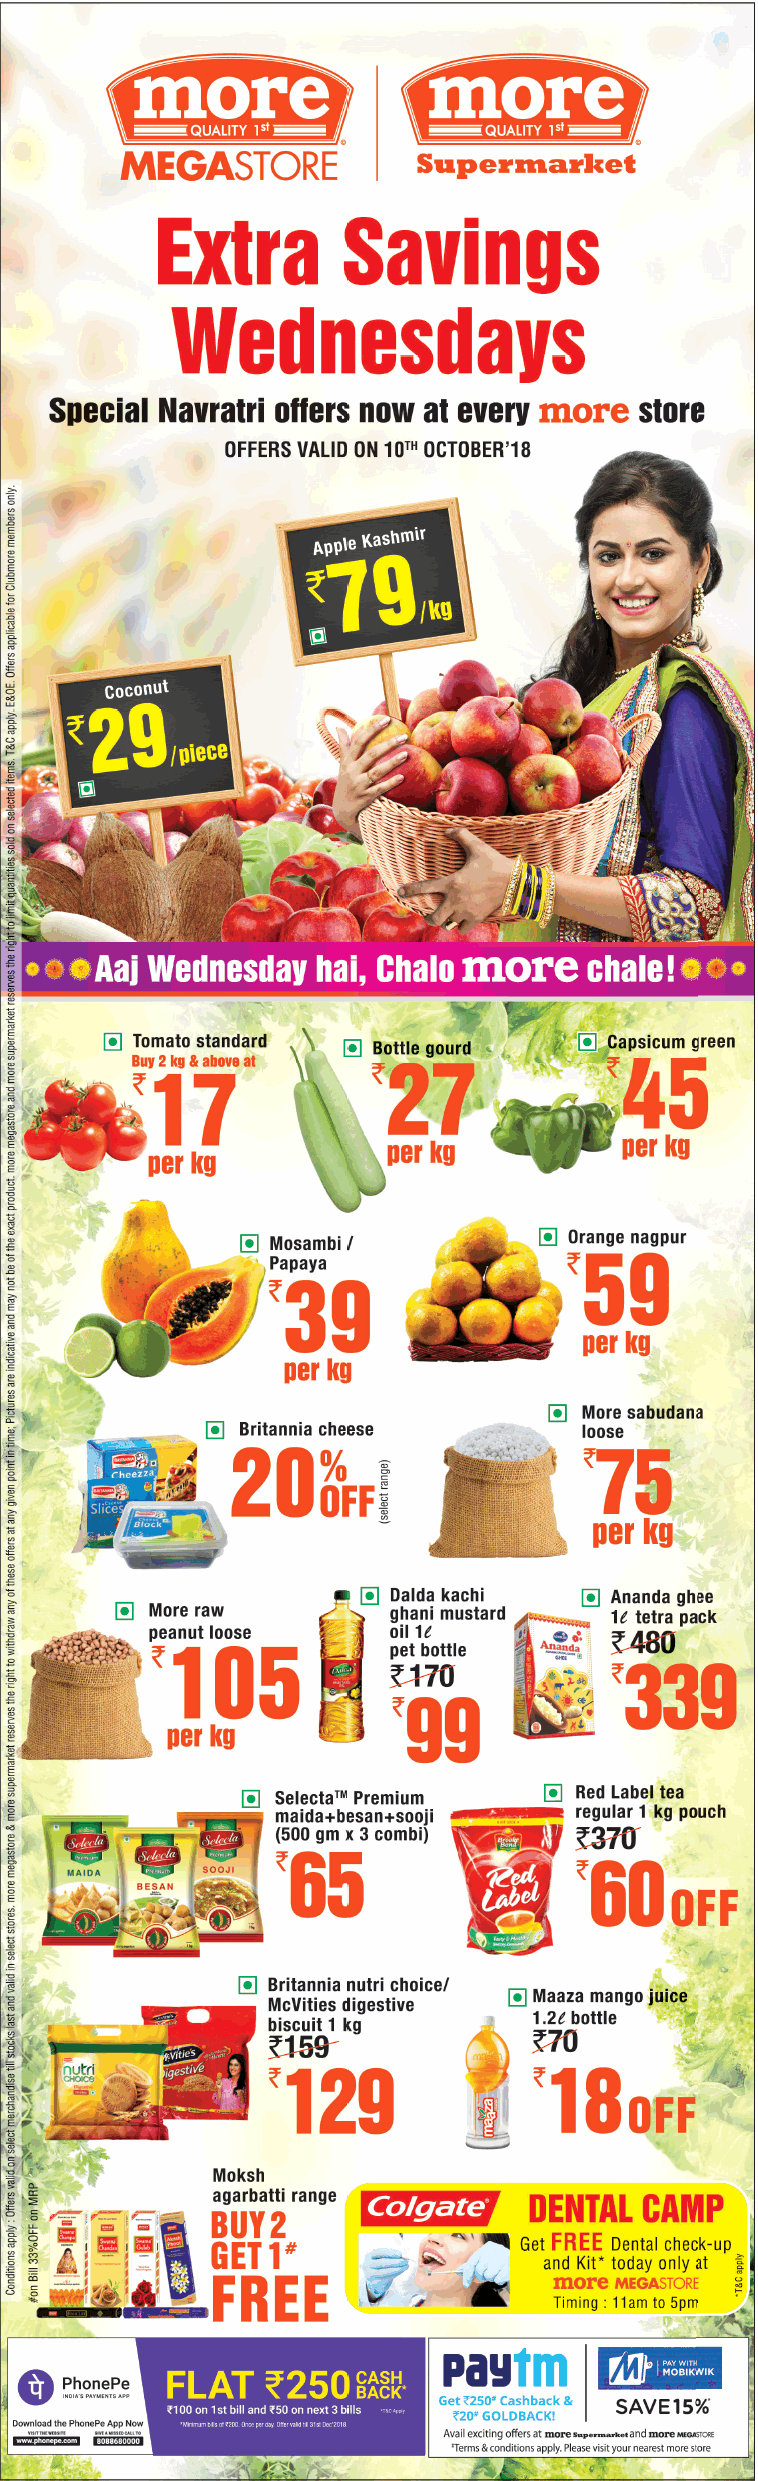 More Supermarket Extra Saving Wednesdays Ad